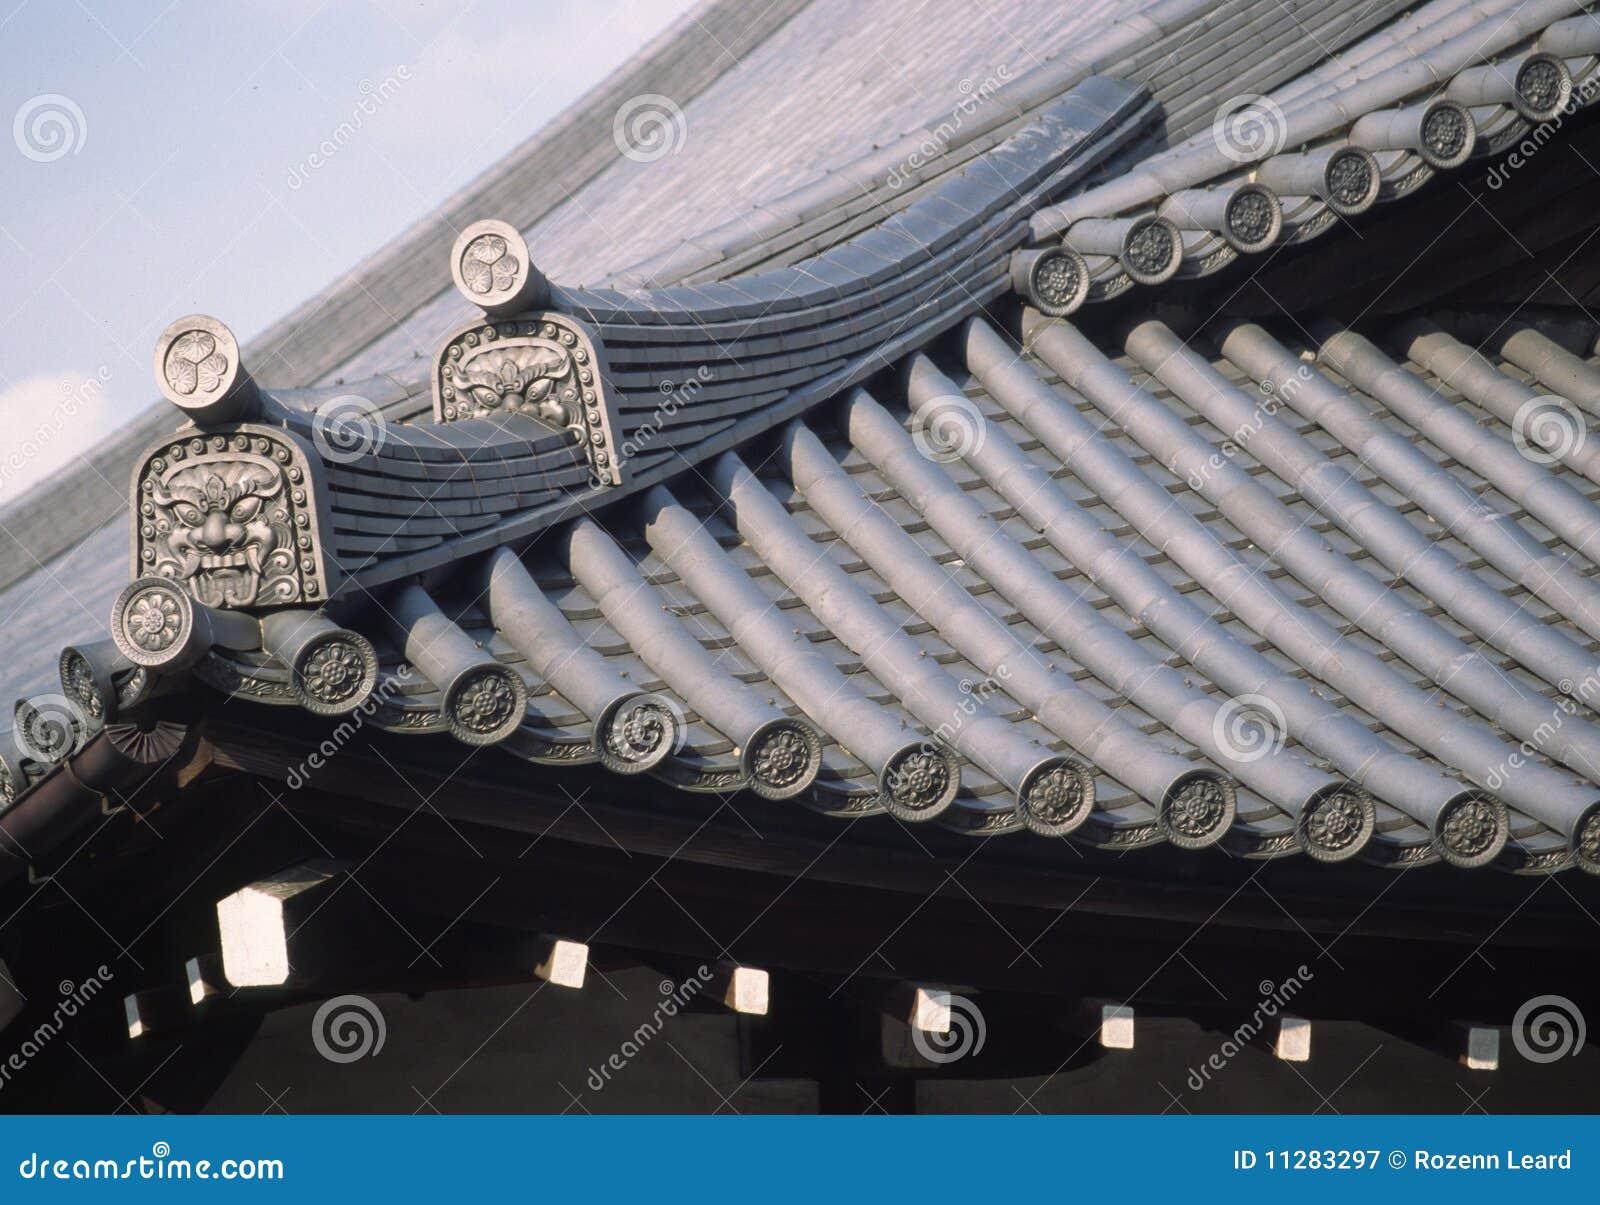 Japanese Tiled Roof Stock Image Image Of Decorative